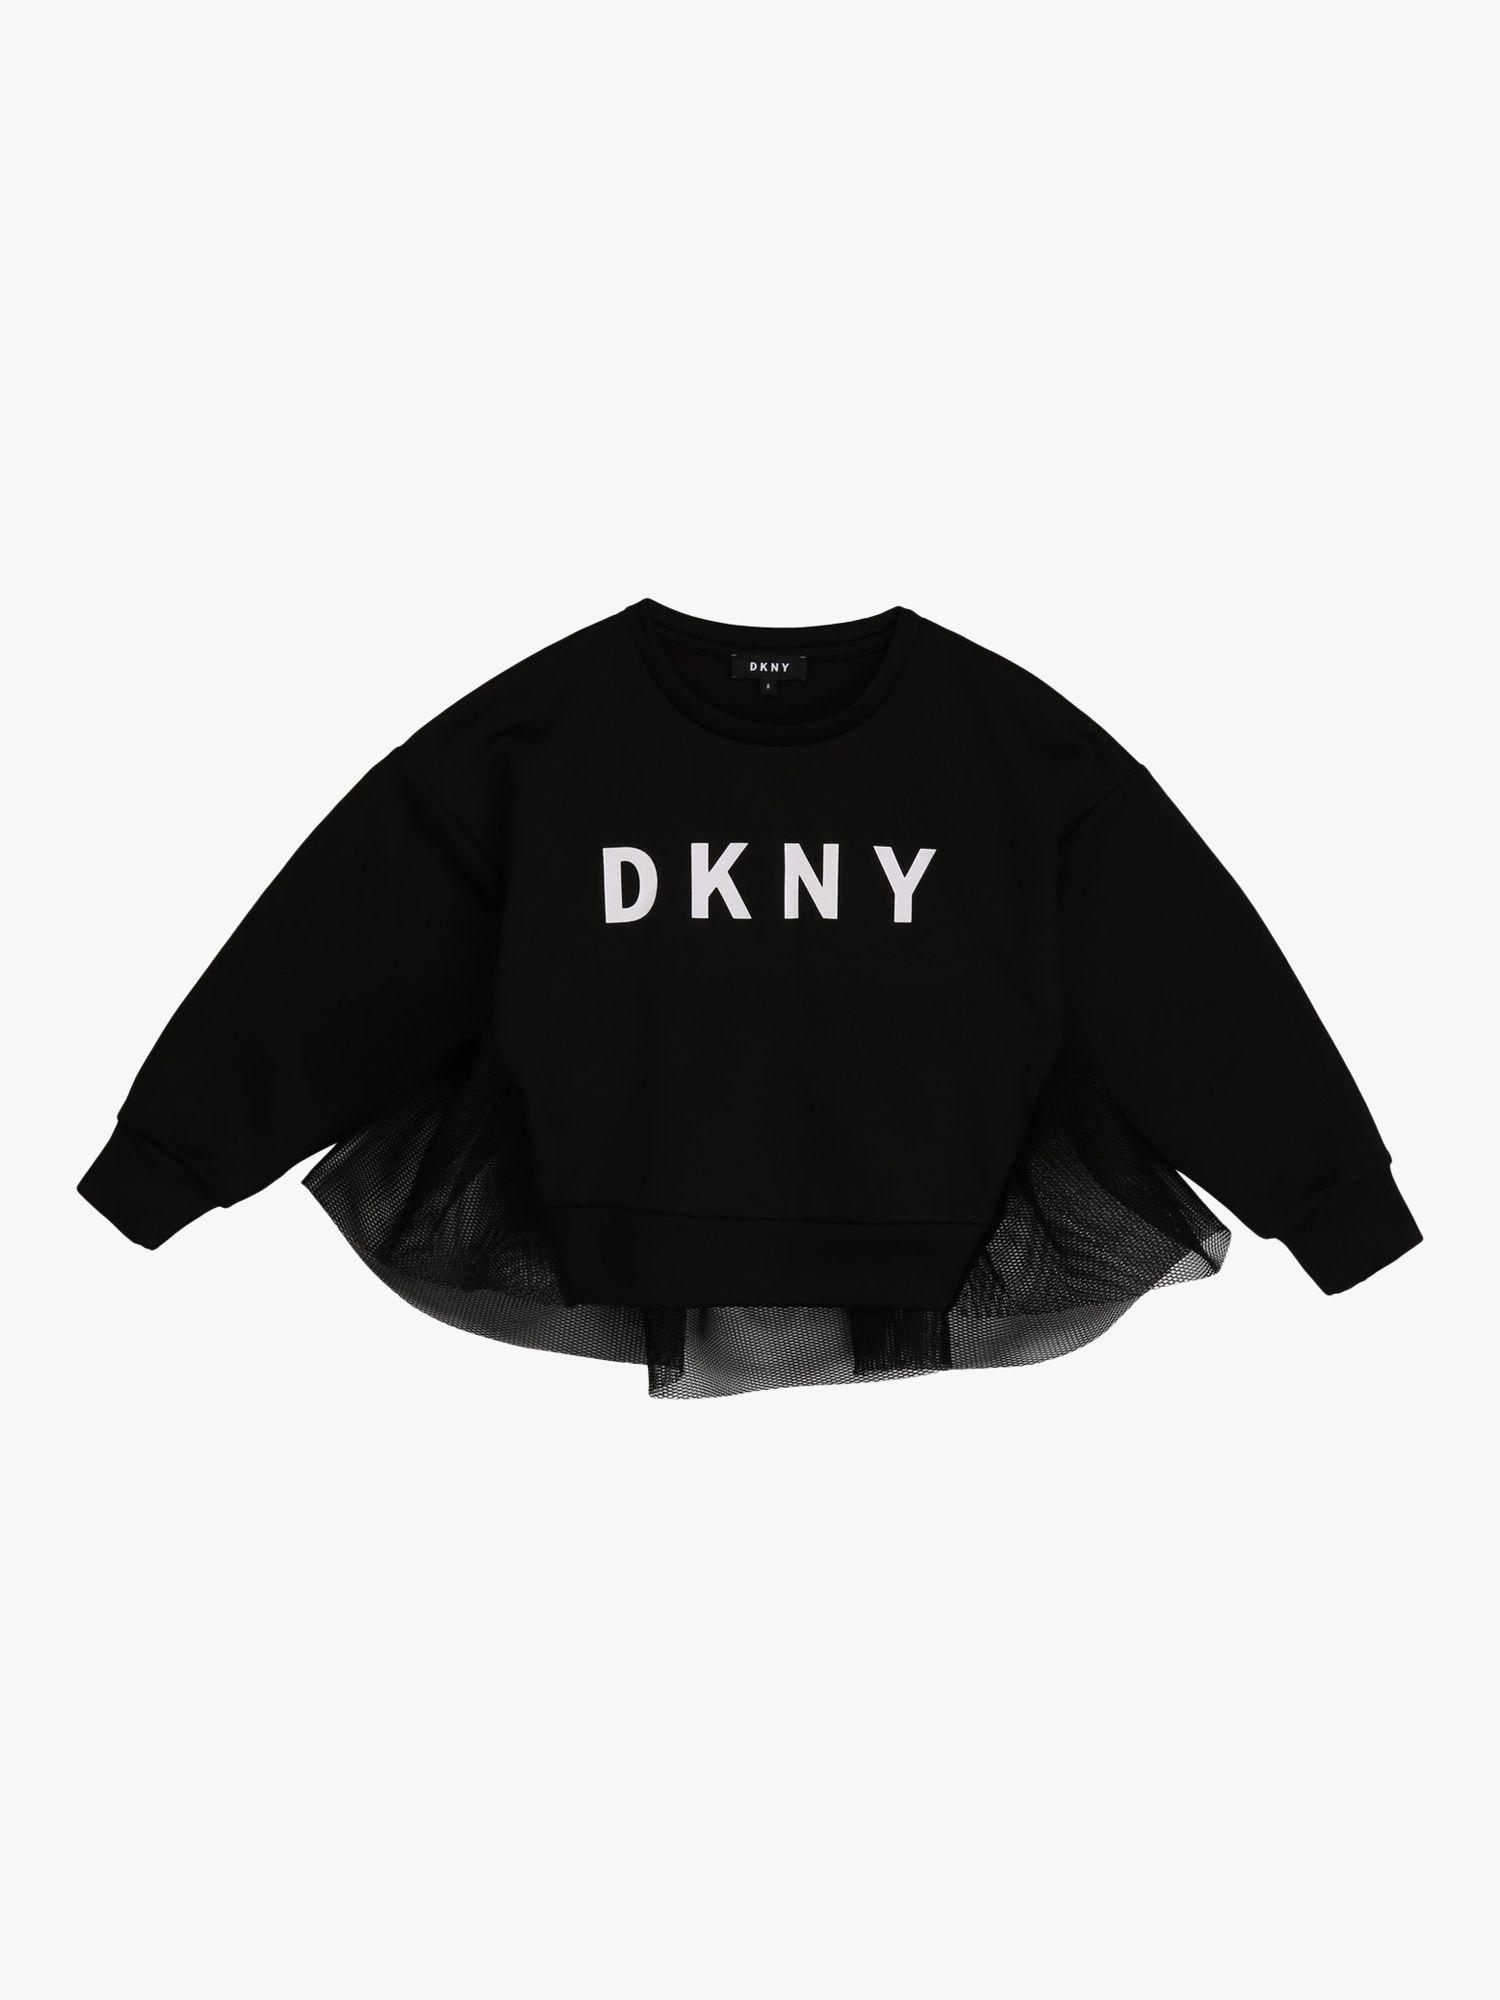 DKNY Girls Sweatshirt